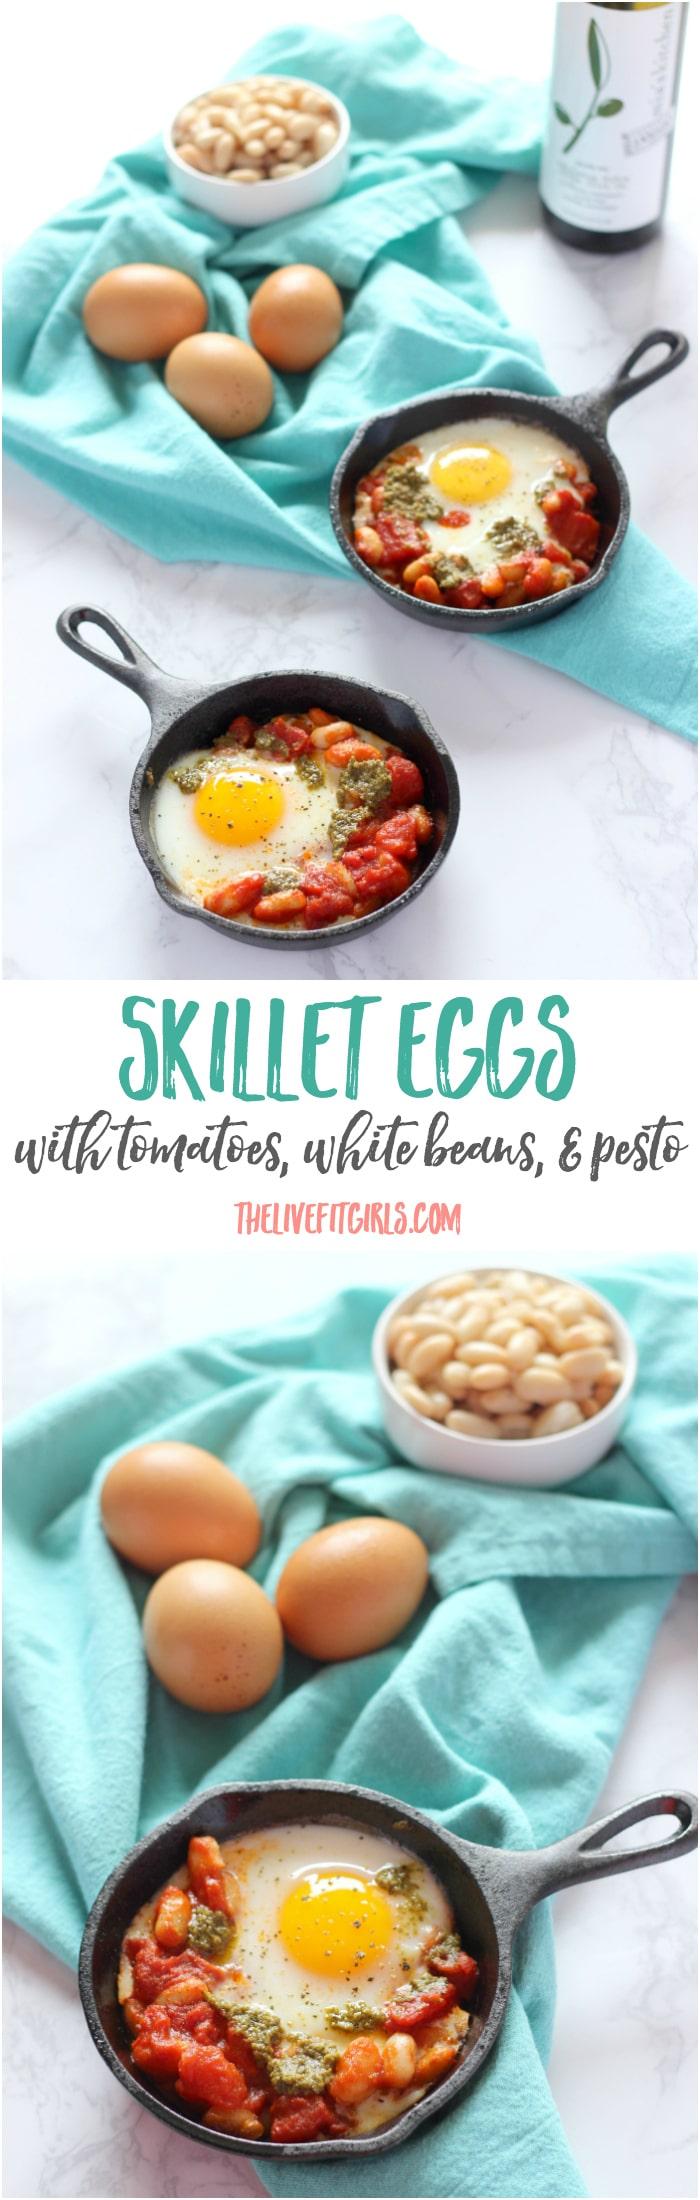 skillet-eggs-pin